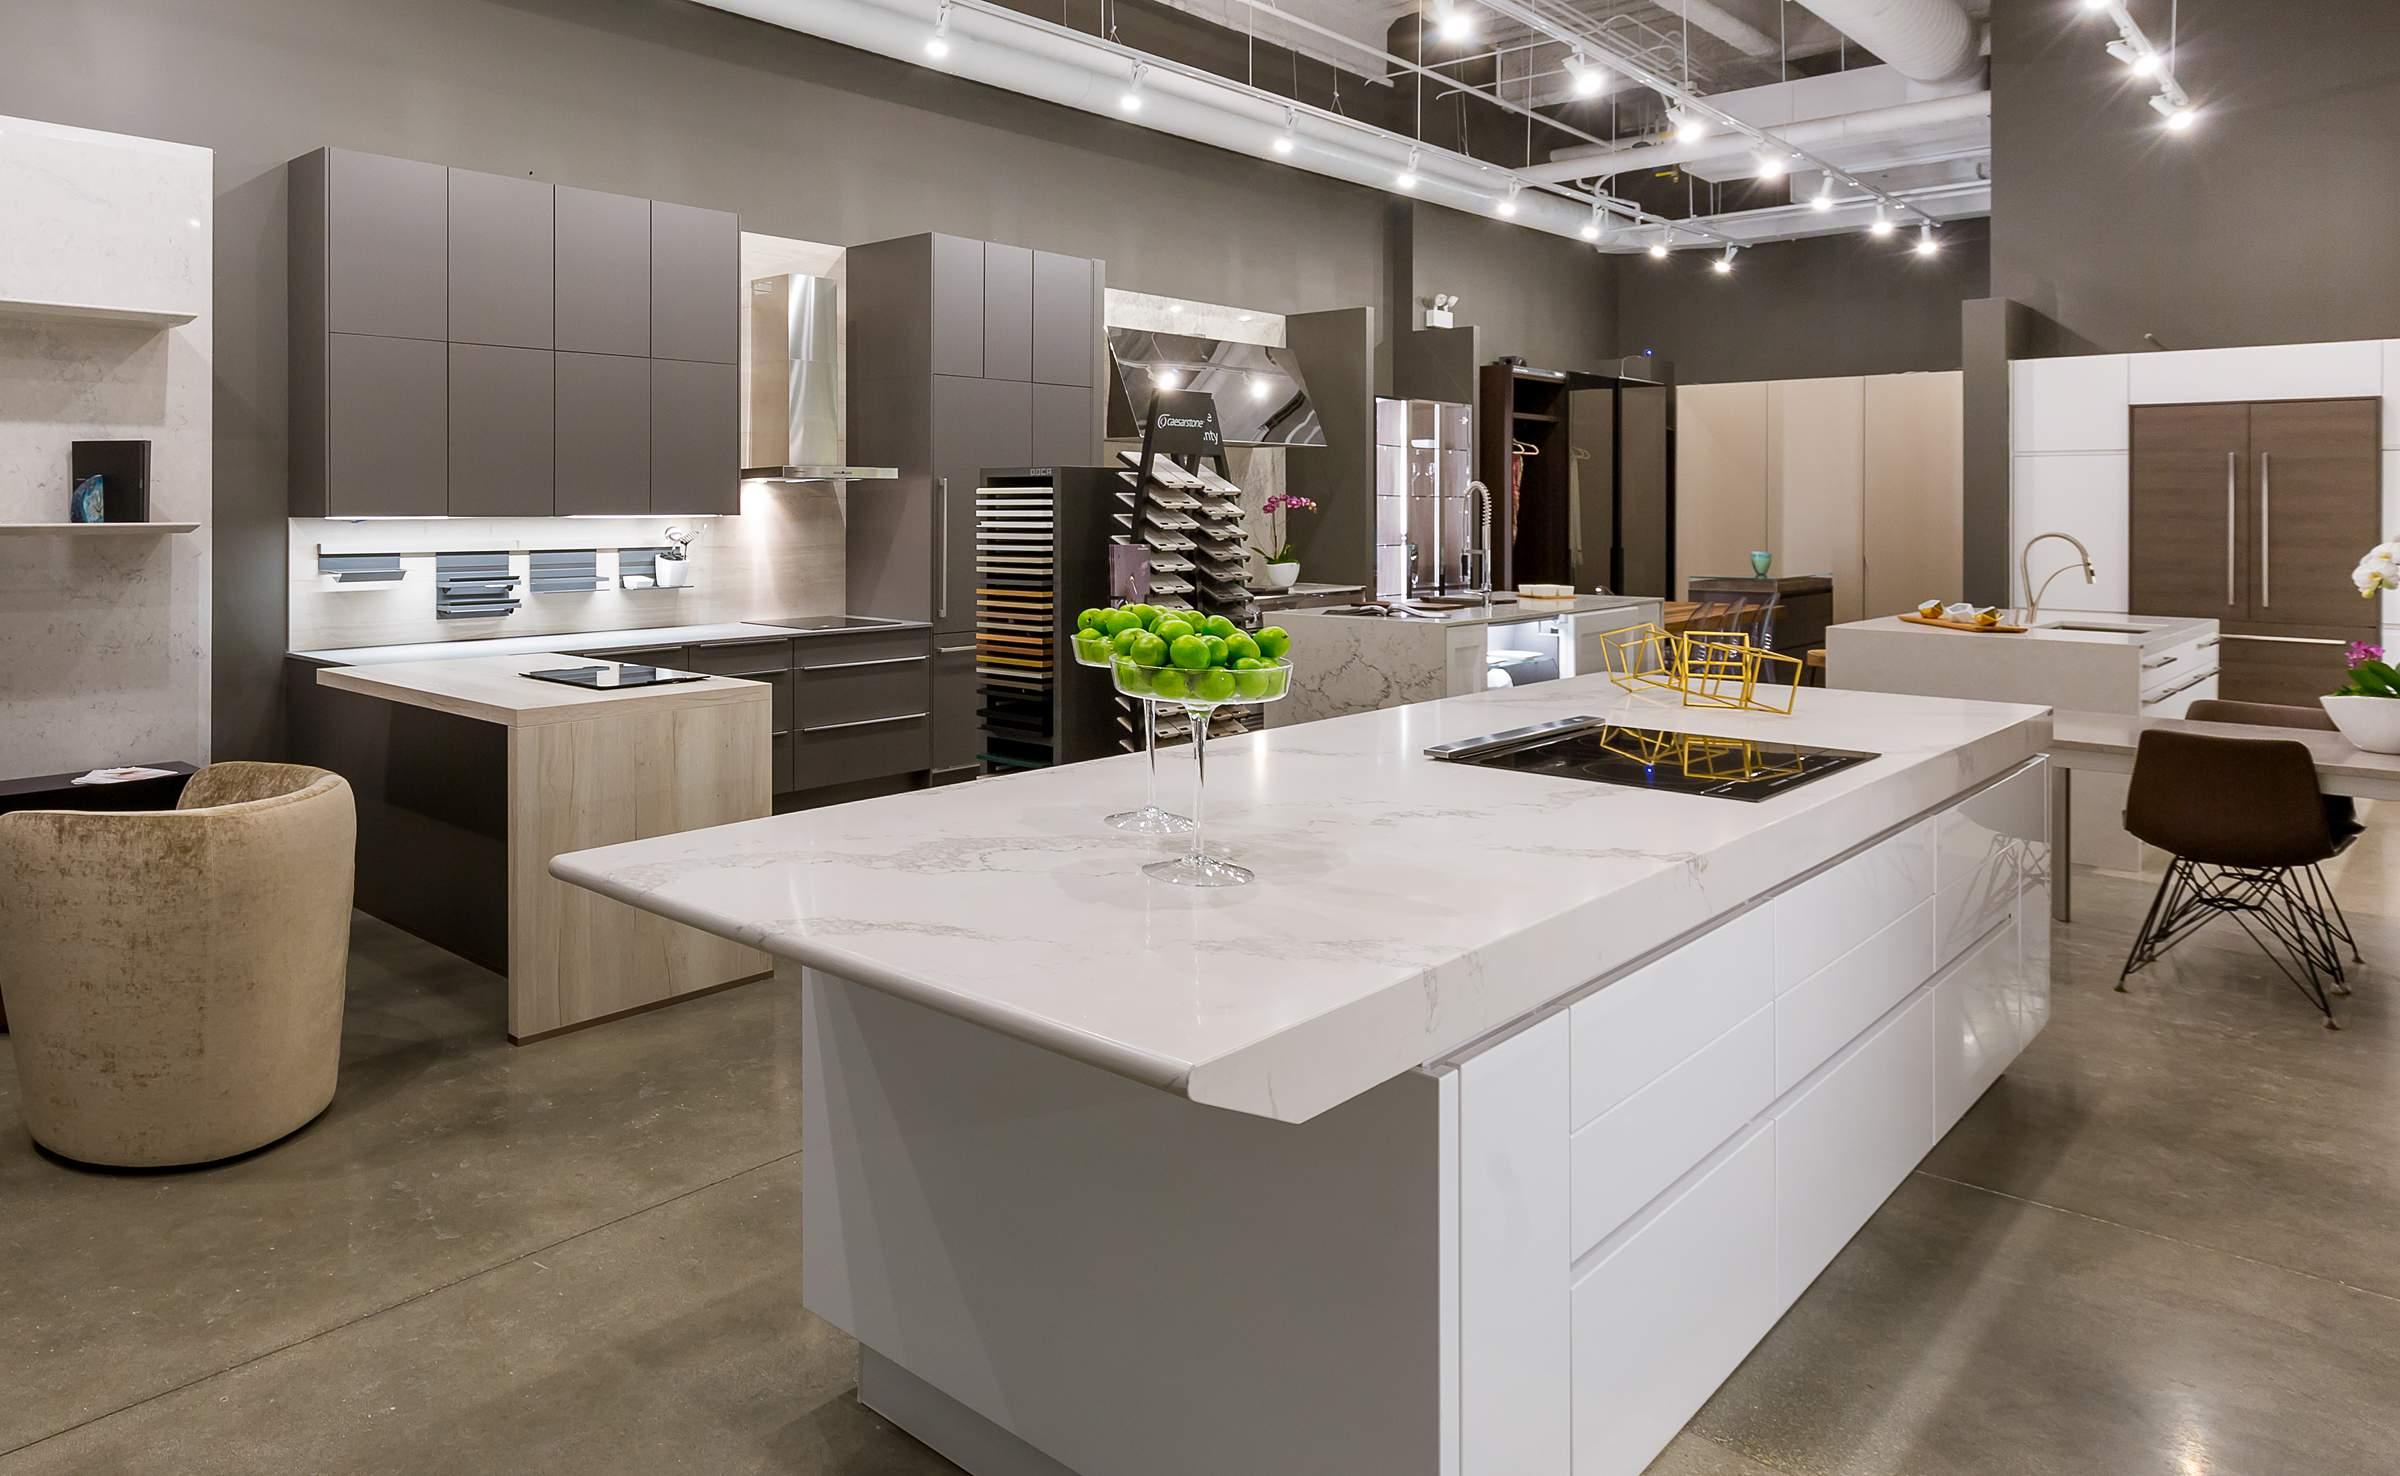 Kitchen Design Showroom Virtual Tour Chicago 360 IMG_0640